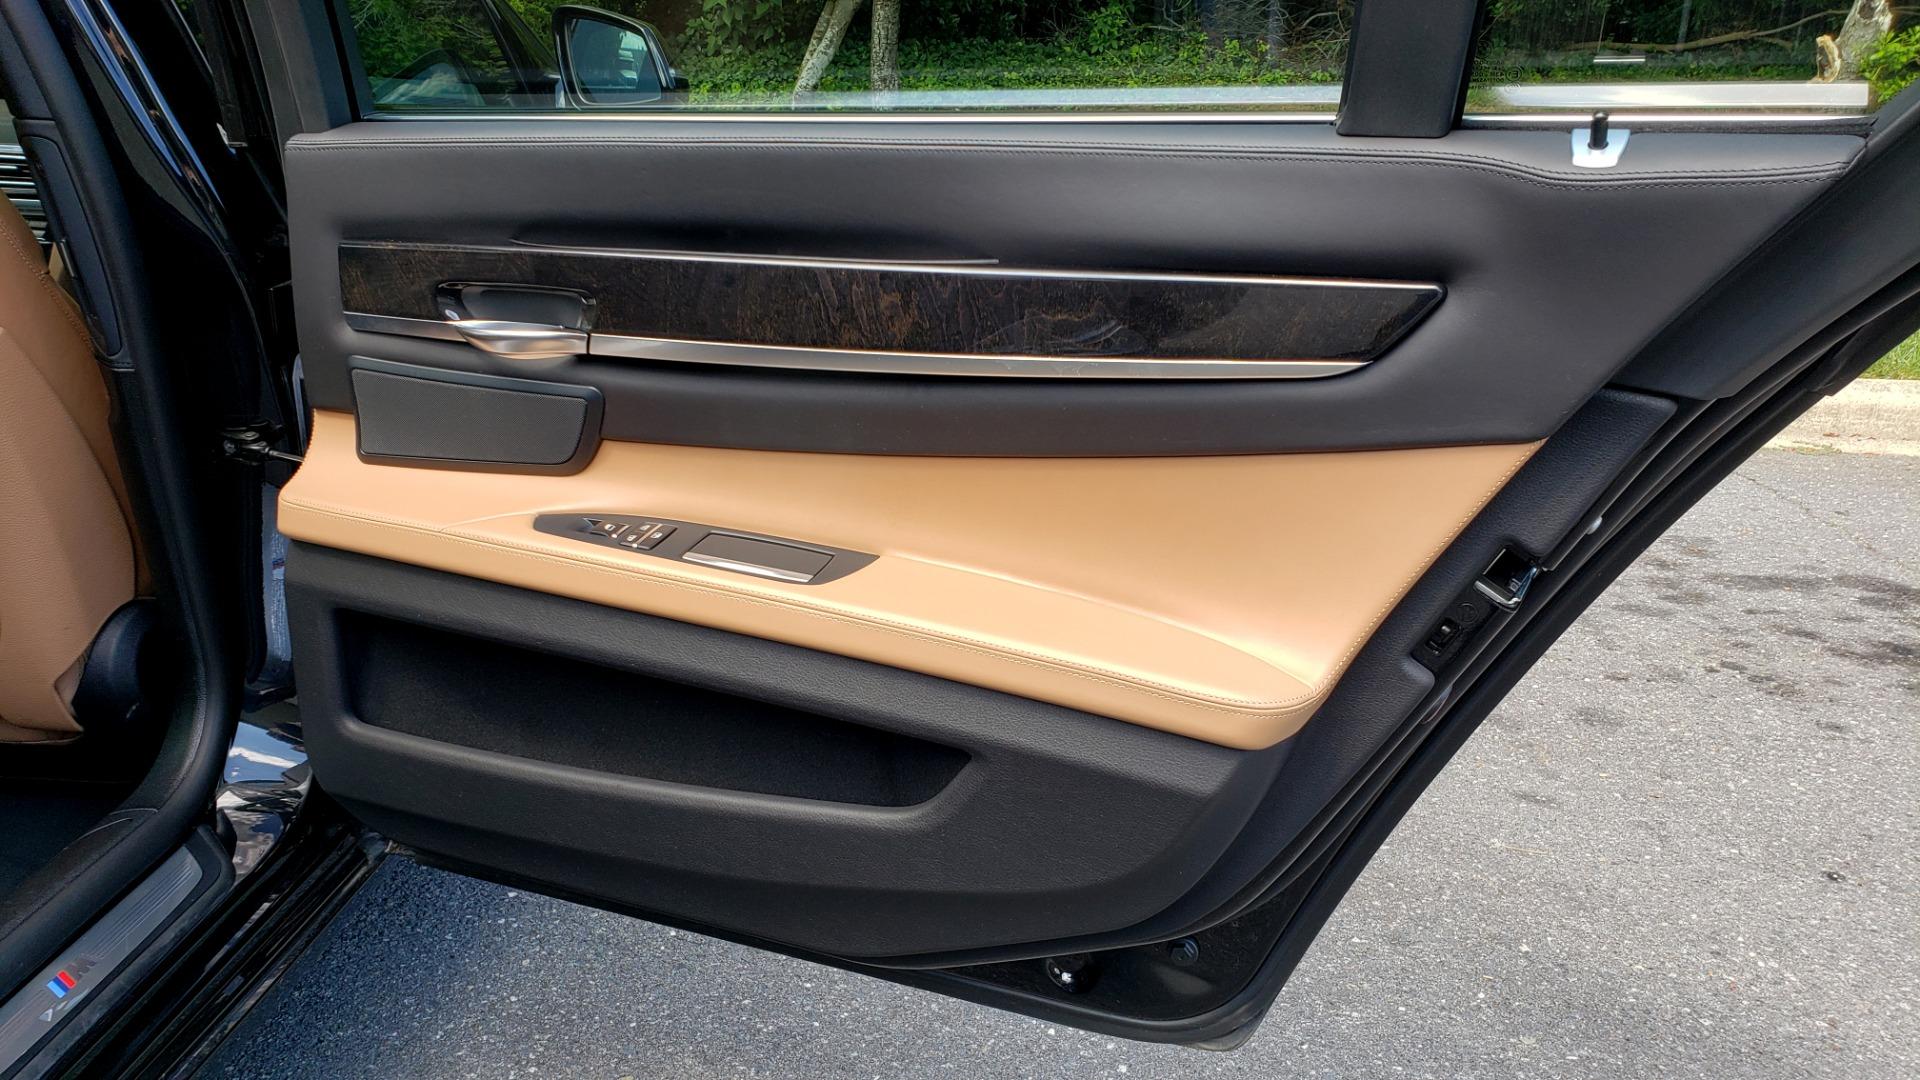 Used 2014 BMW 7 SERIES 750LI M-SPORT / EXEC PKG / DRVR ASST / LIGHTING / NAV / SUNROOF for sale Sold at Formula Imports in Charlotte NC 28227 67